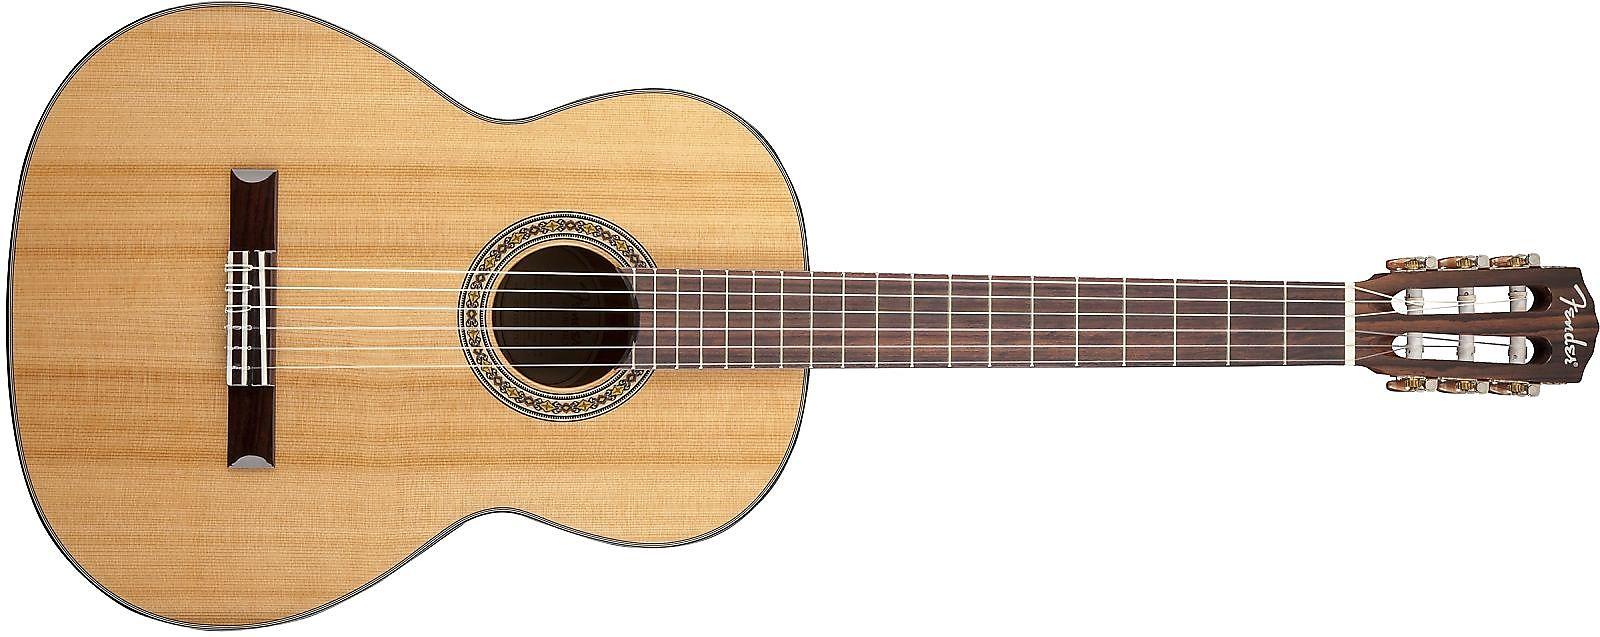 Fender Cn 140s Solid Cedar Rosewood Classical Natural Reverb